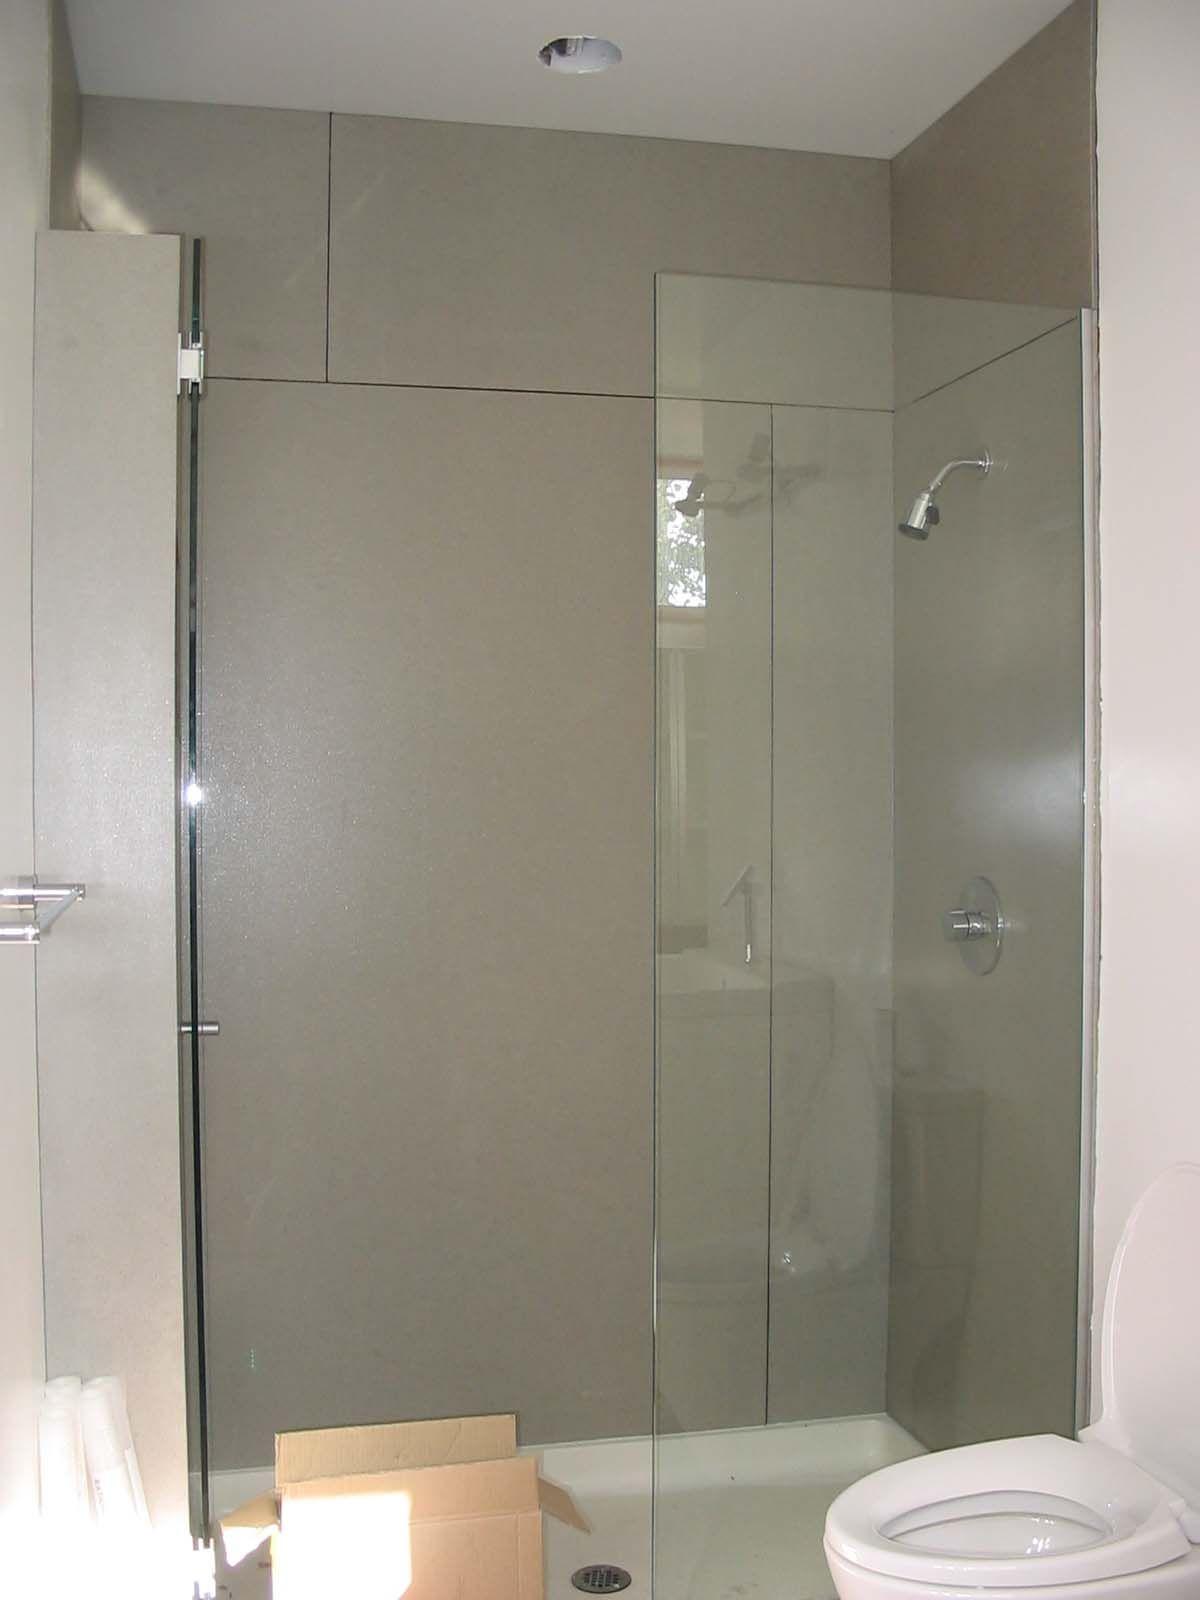 Shower Stall Deco Poz Deco Poz Pinterest Concrete